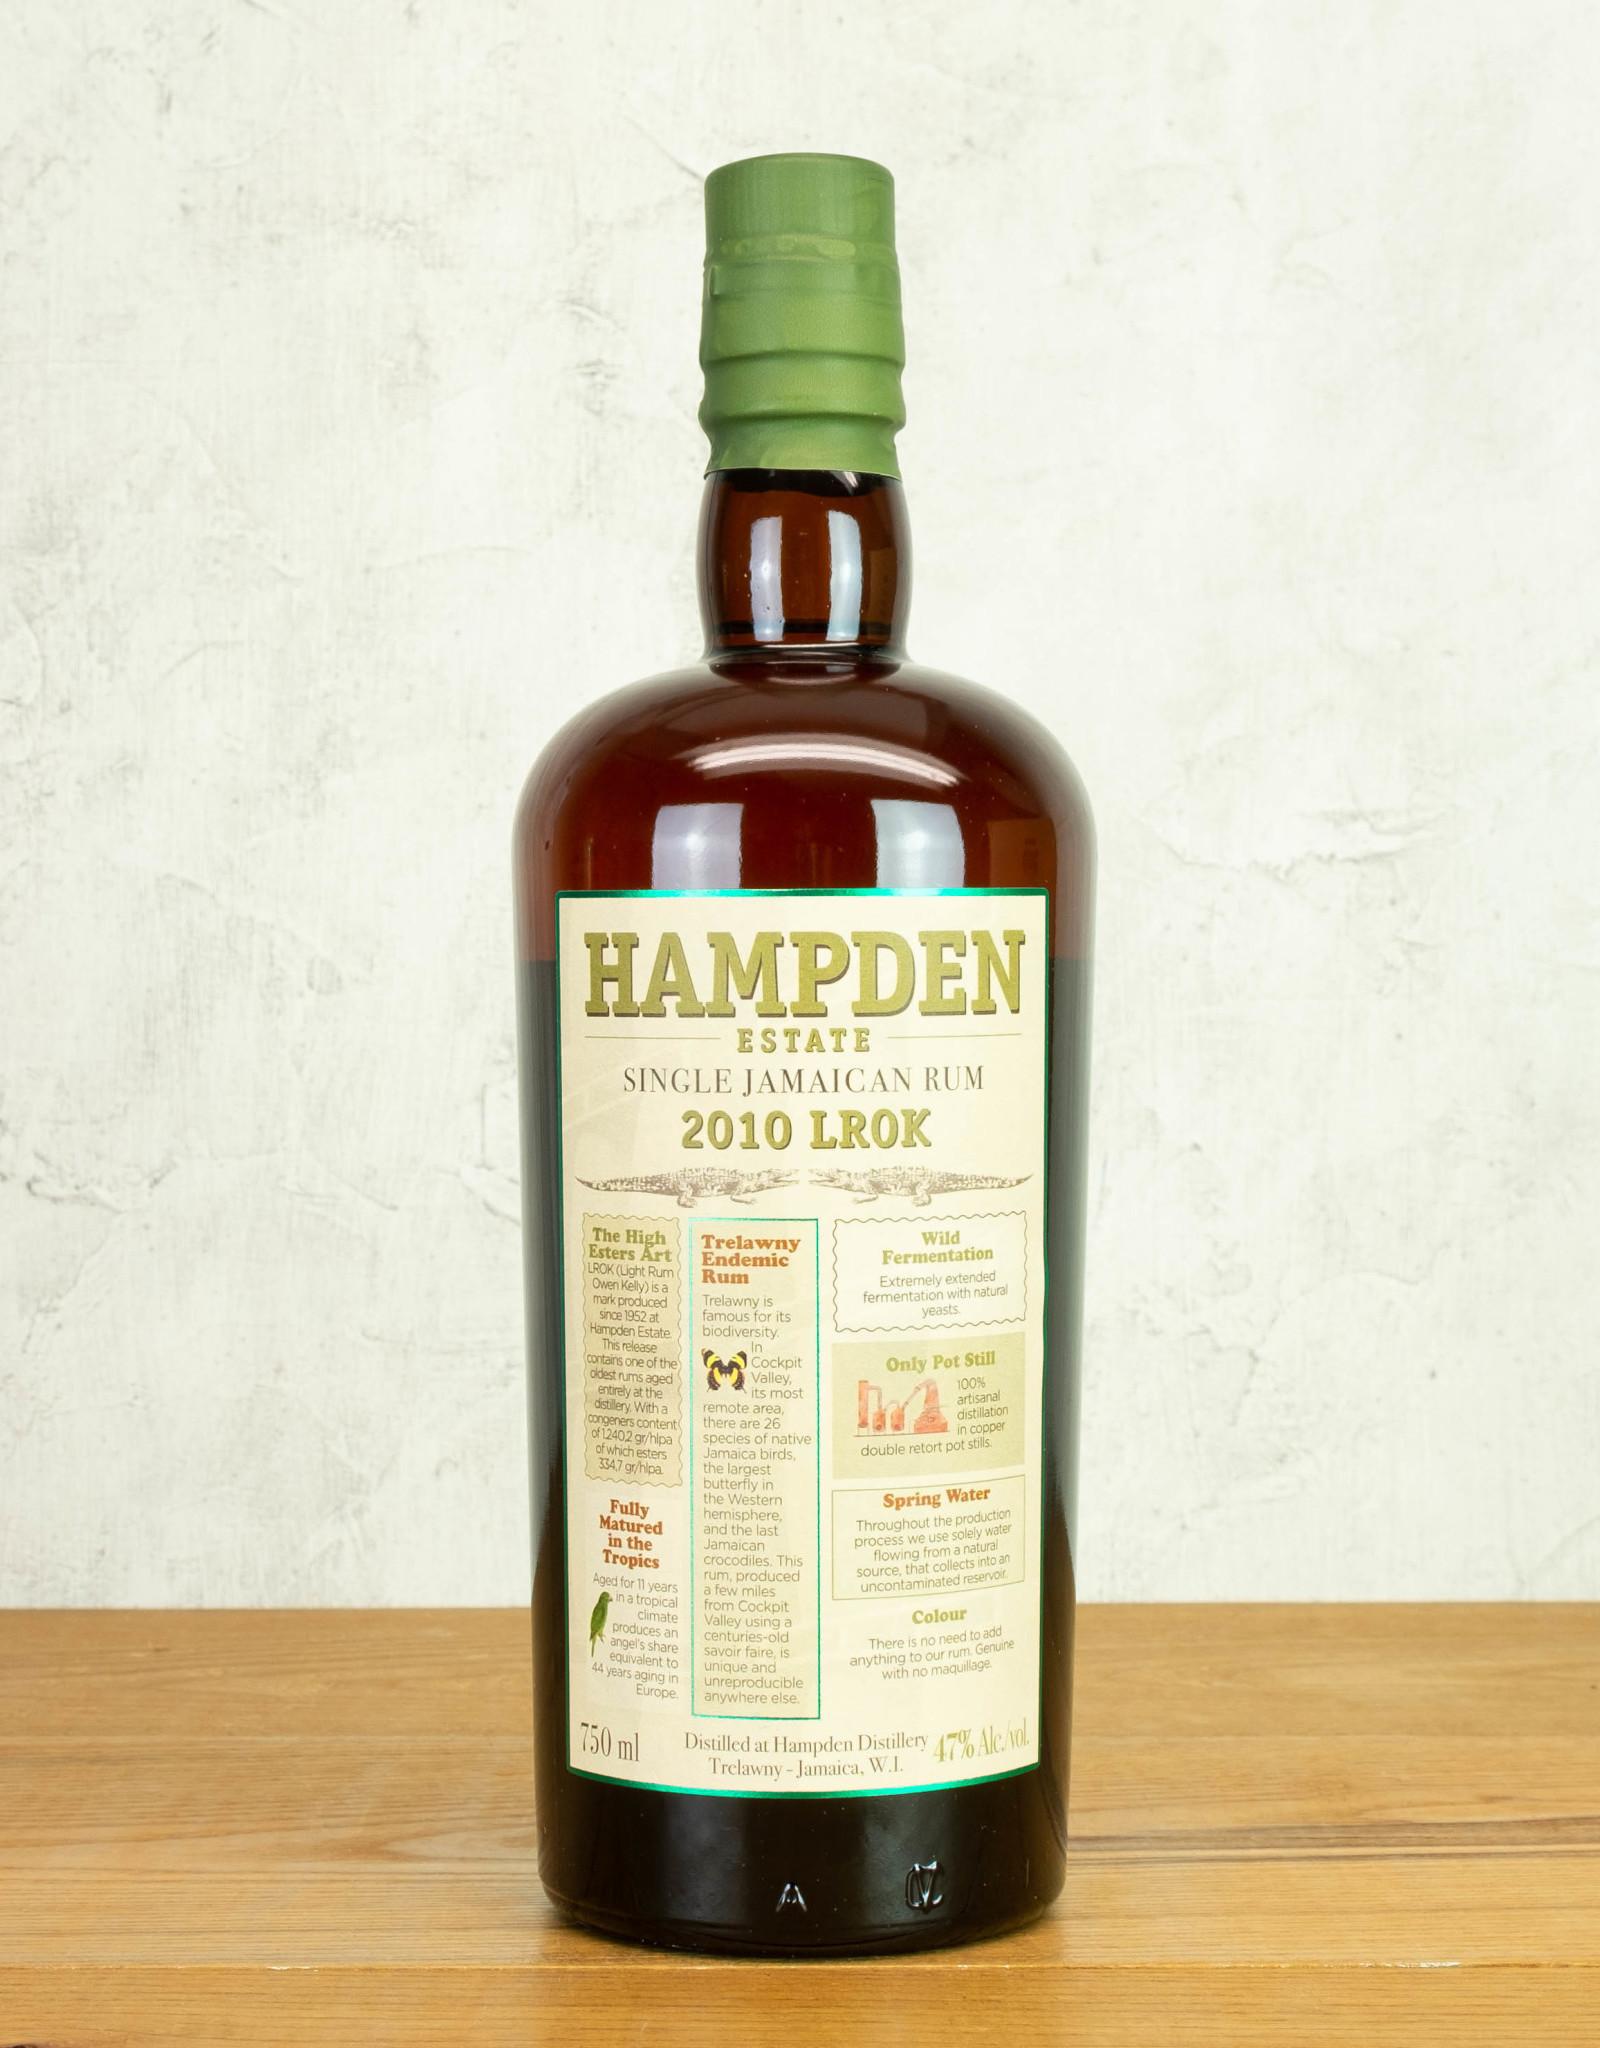 Hampden Estate 2010 LROK Jamaican Rum